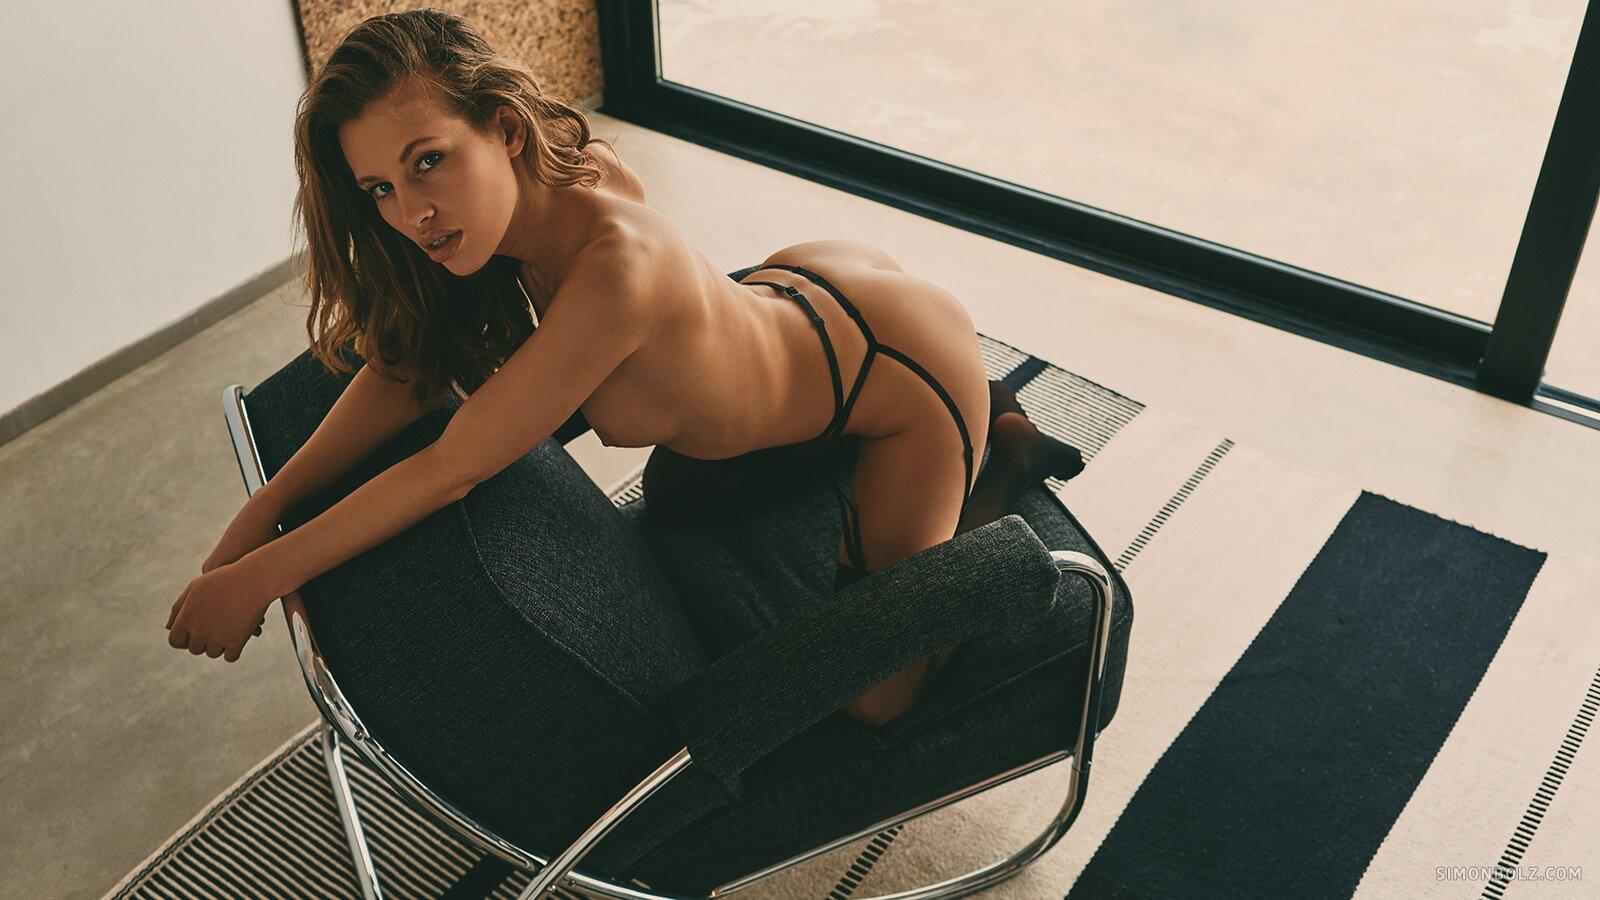 Katia / Photographed by Simon Bolz